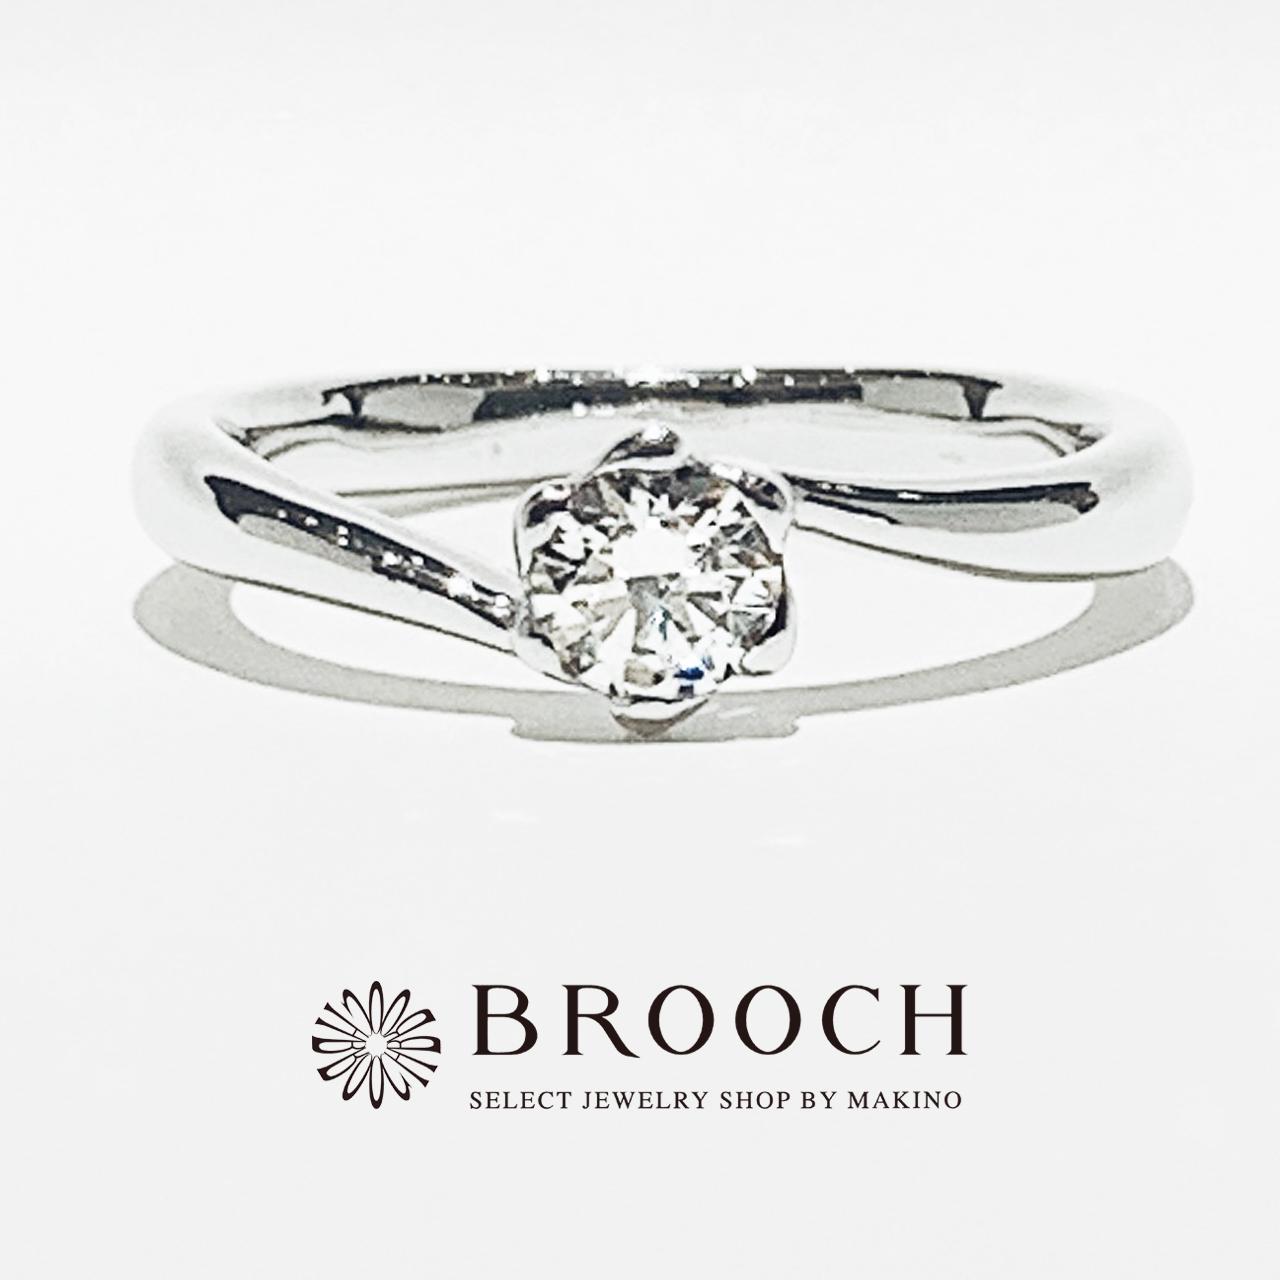 BROOCH 婚約指輪 エンゲージリング かわいい シンプルなウェーブデザイン